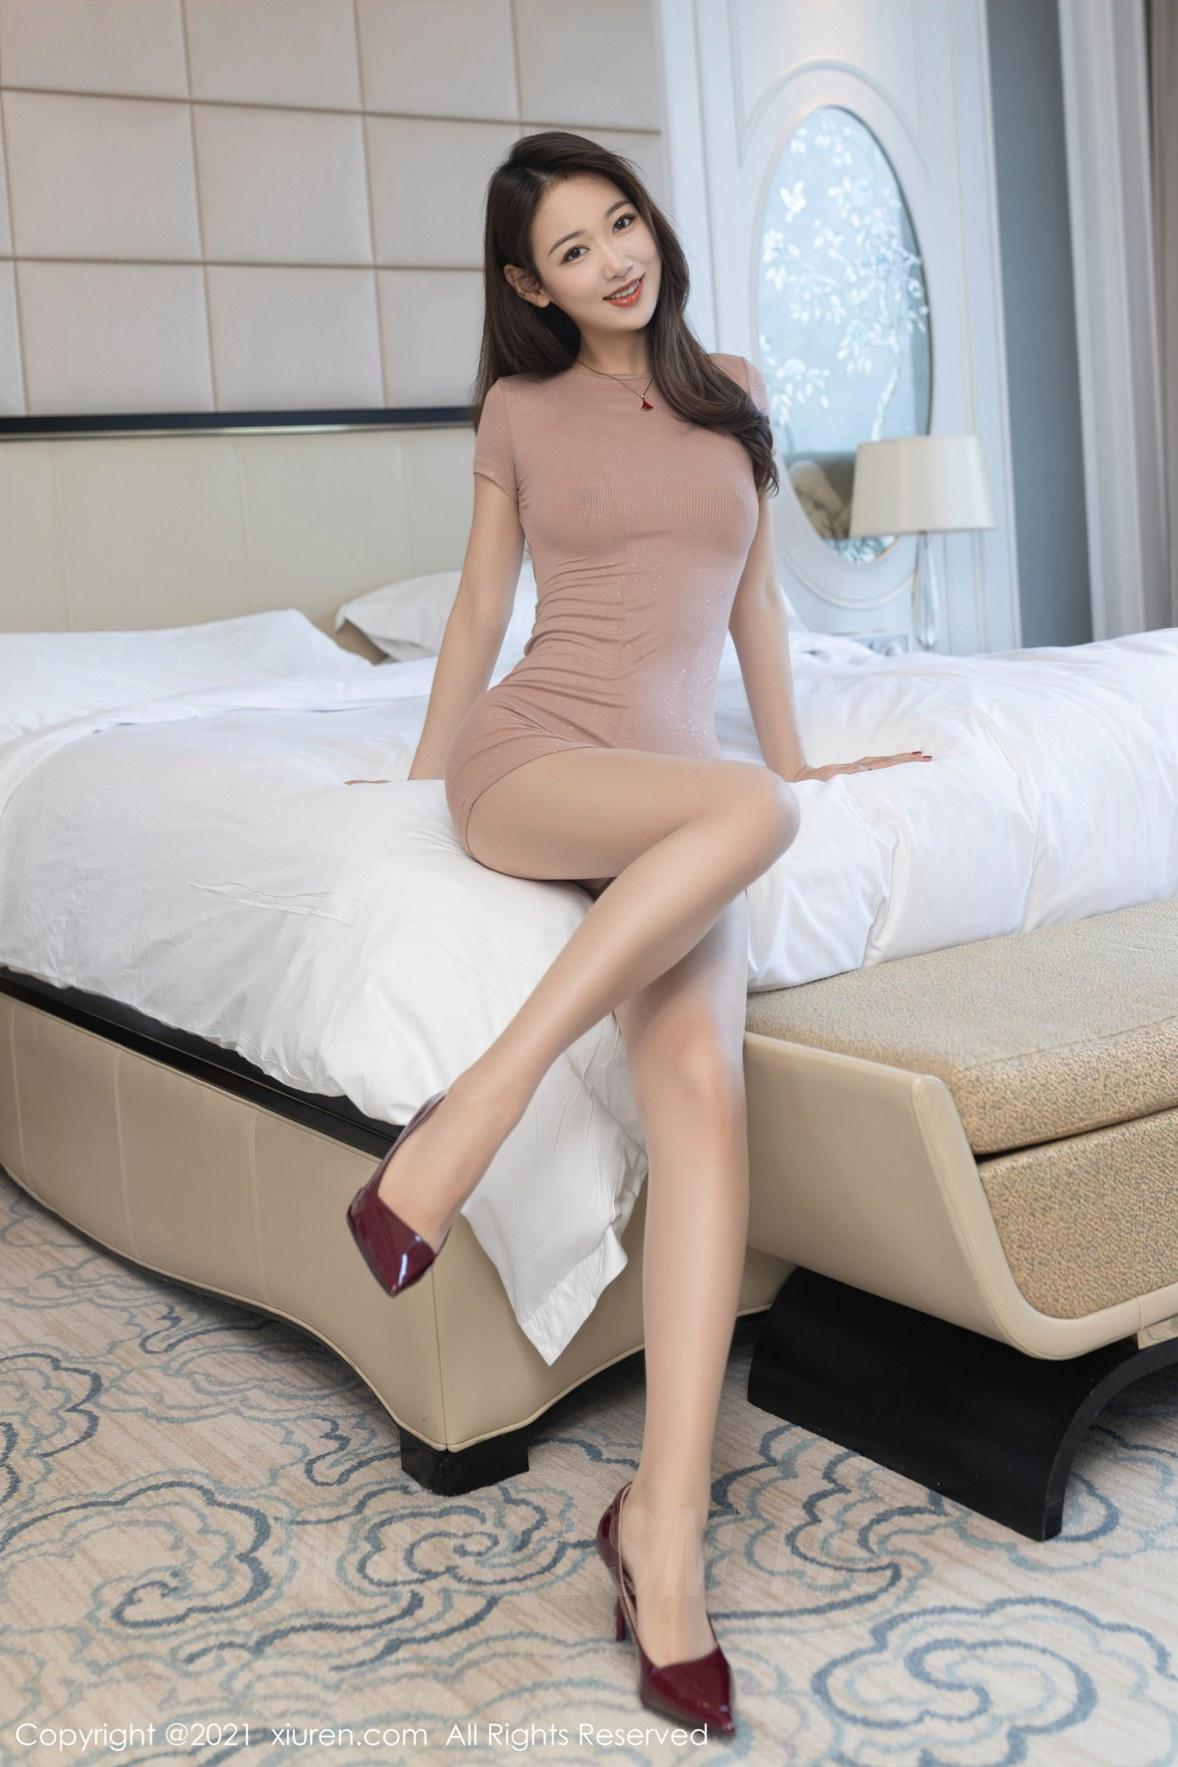 3780 013 kx6 3600 5400 - XiuRen 秀人 No.3780 裸色裙主题系列 唐安琪 澳门旅拍写真22 - 秀人网 -【免费在线写真】【丽人丝语】